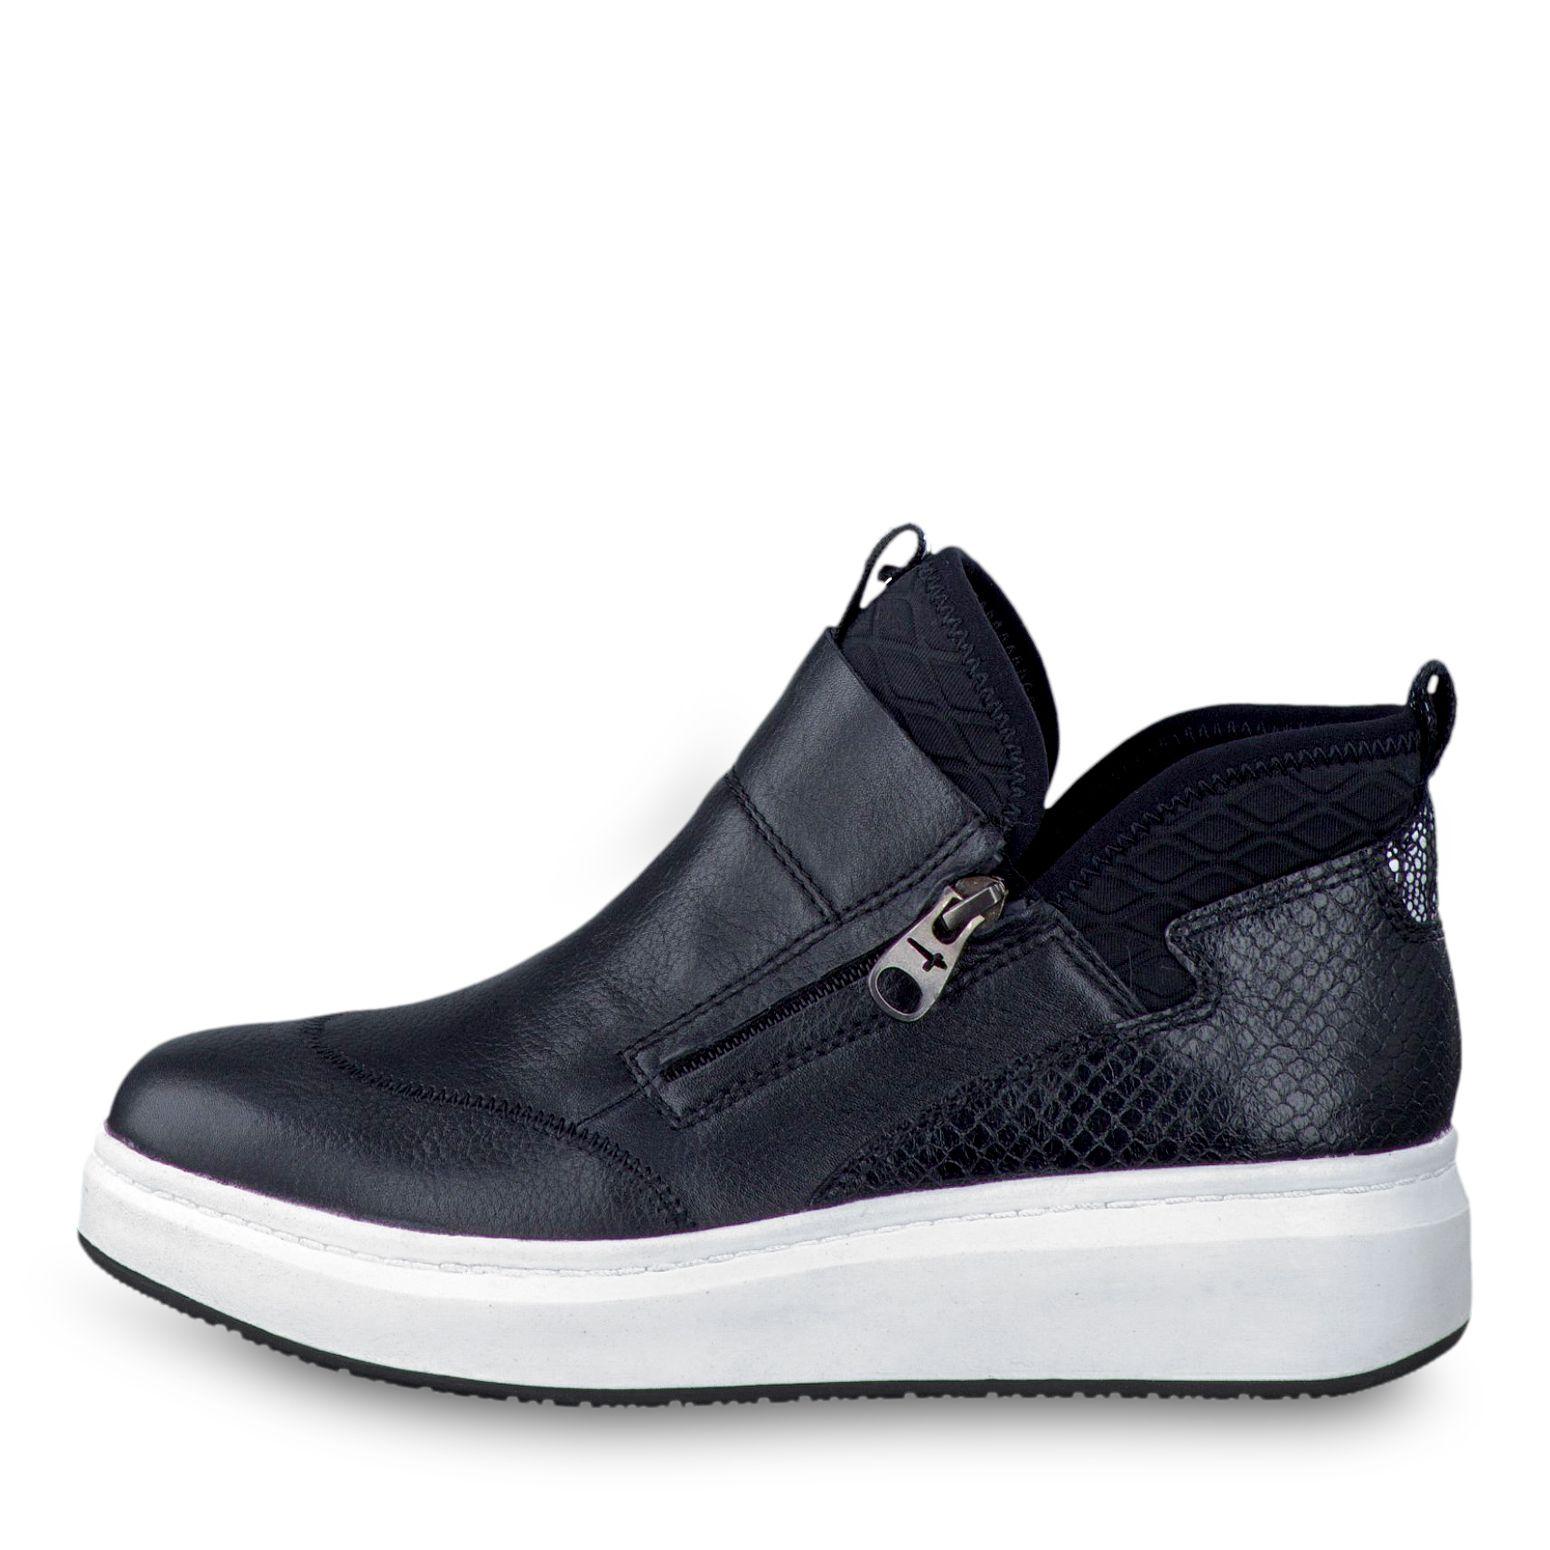 louis 1 1 25422 29 buy tamaris sneakers online. Black Bedroom Furniture Sets. Home Design Ideas